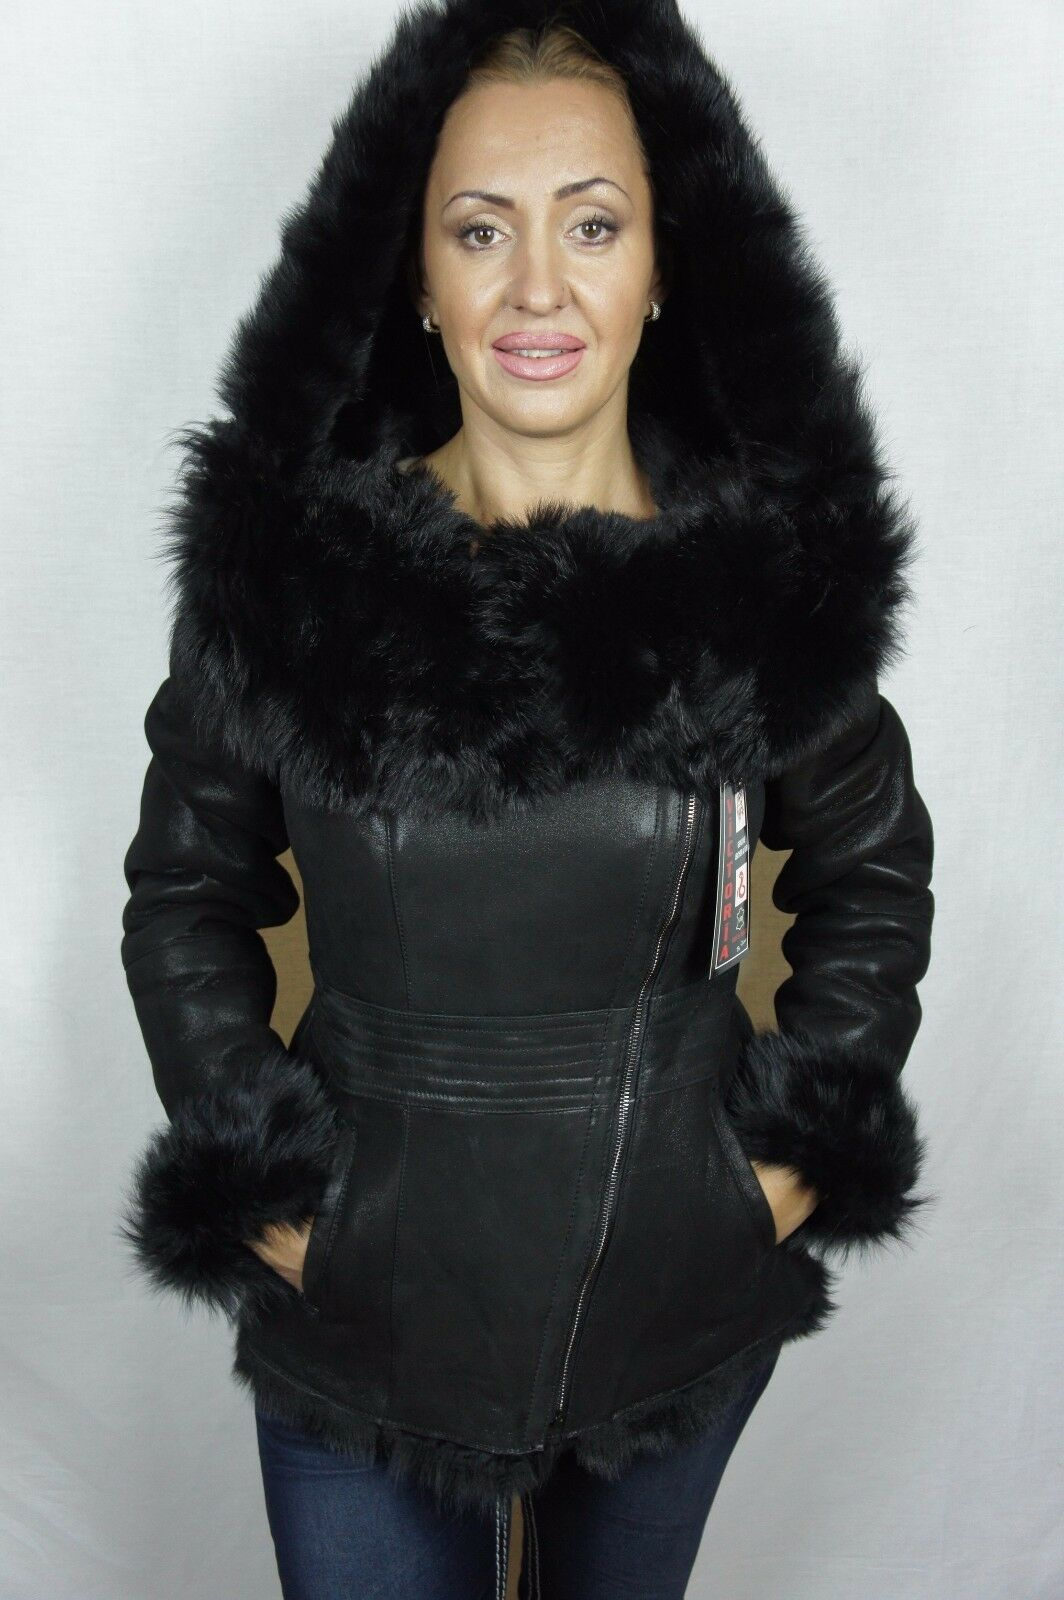 Negra, 100% Piel De Oveja Toscana  de piel de oveja Cuero Piel De Cordero Capucha Abrigo Chaqueta xs-7xl  nuevo sádico